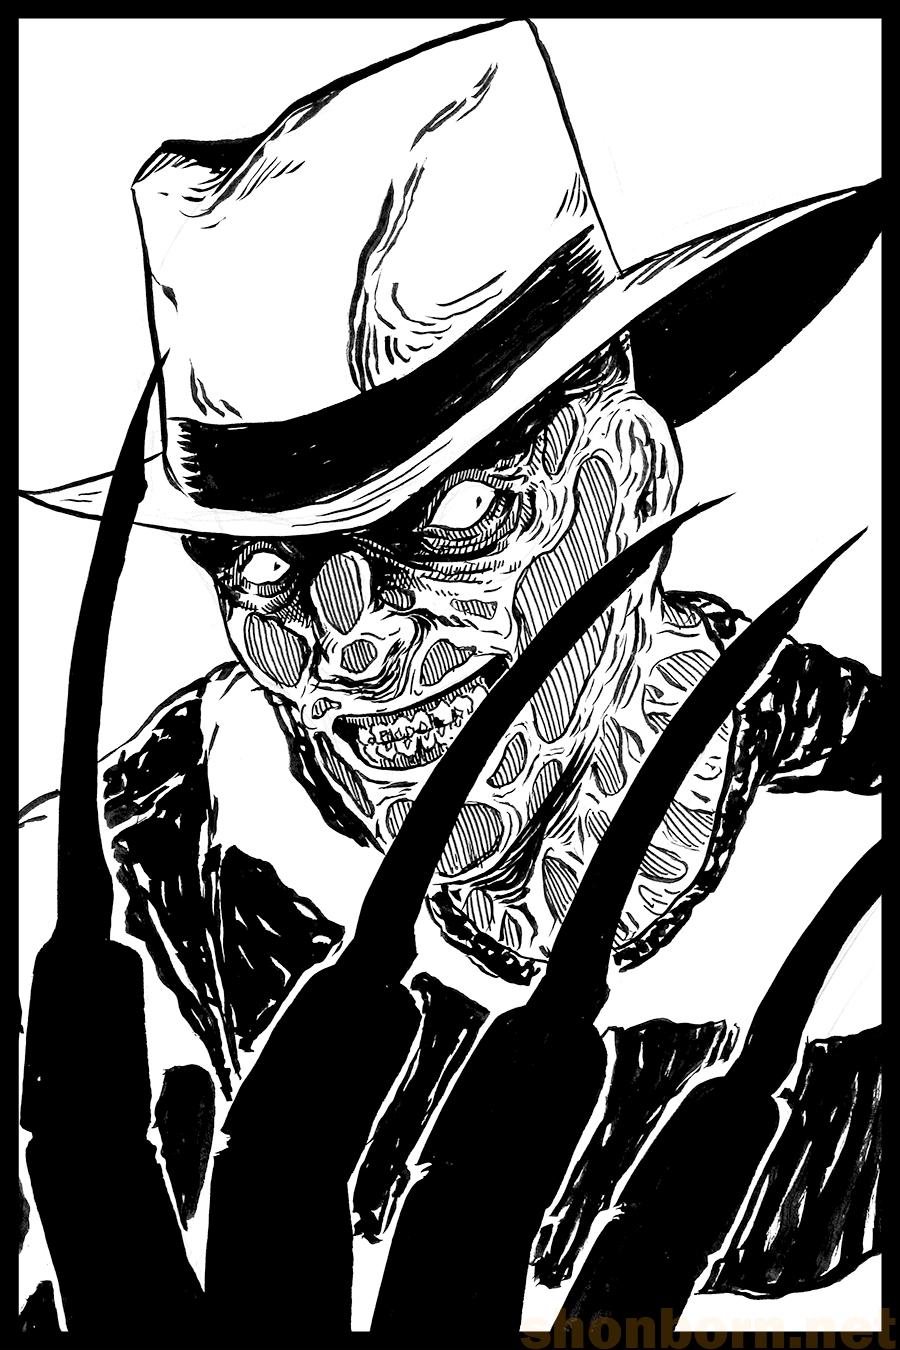 6. Freddy Krueger